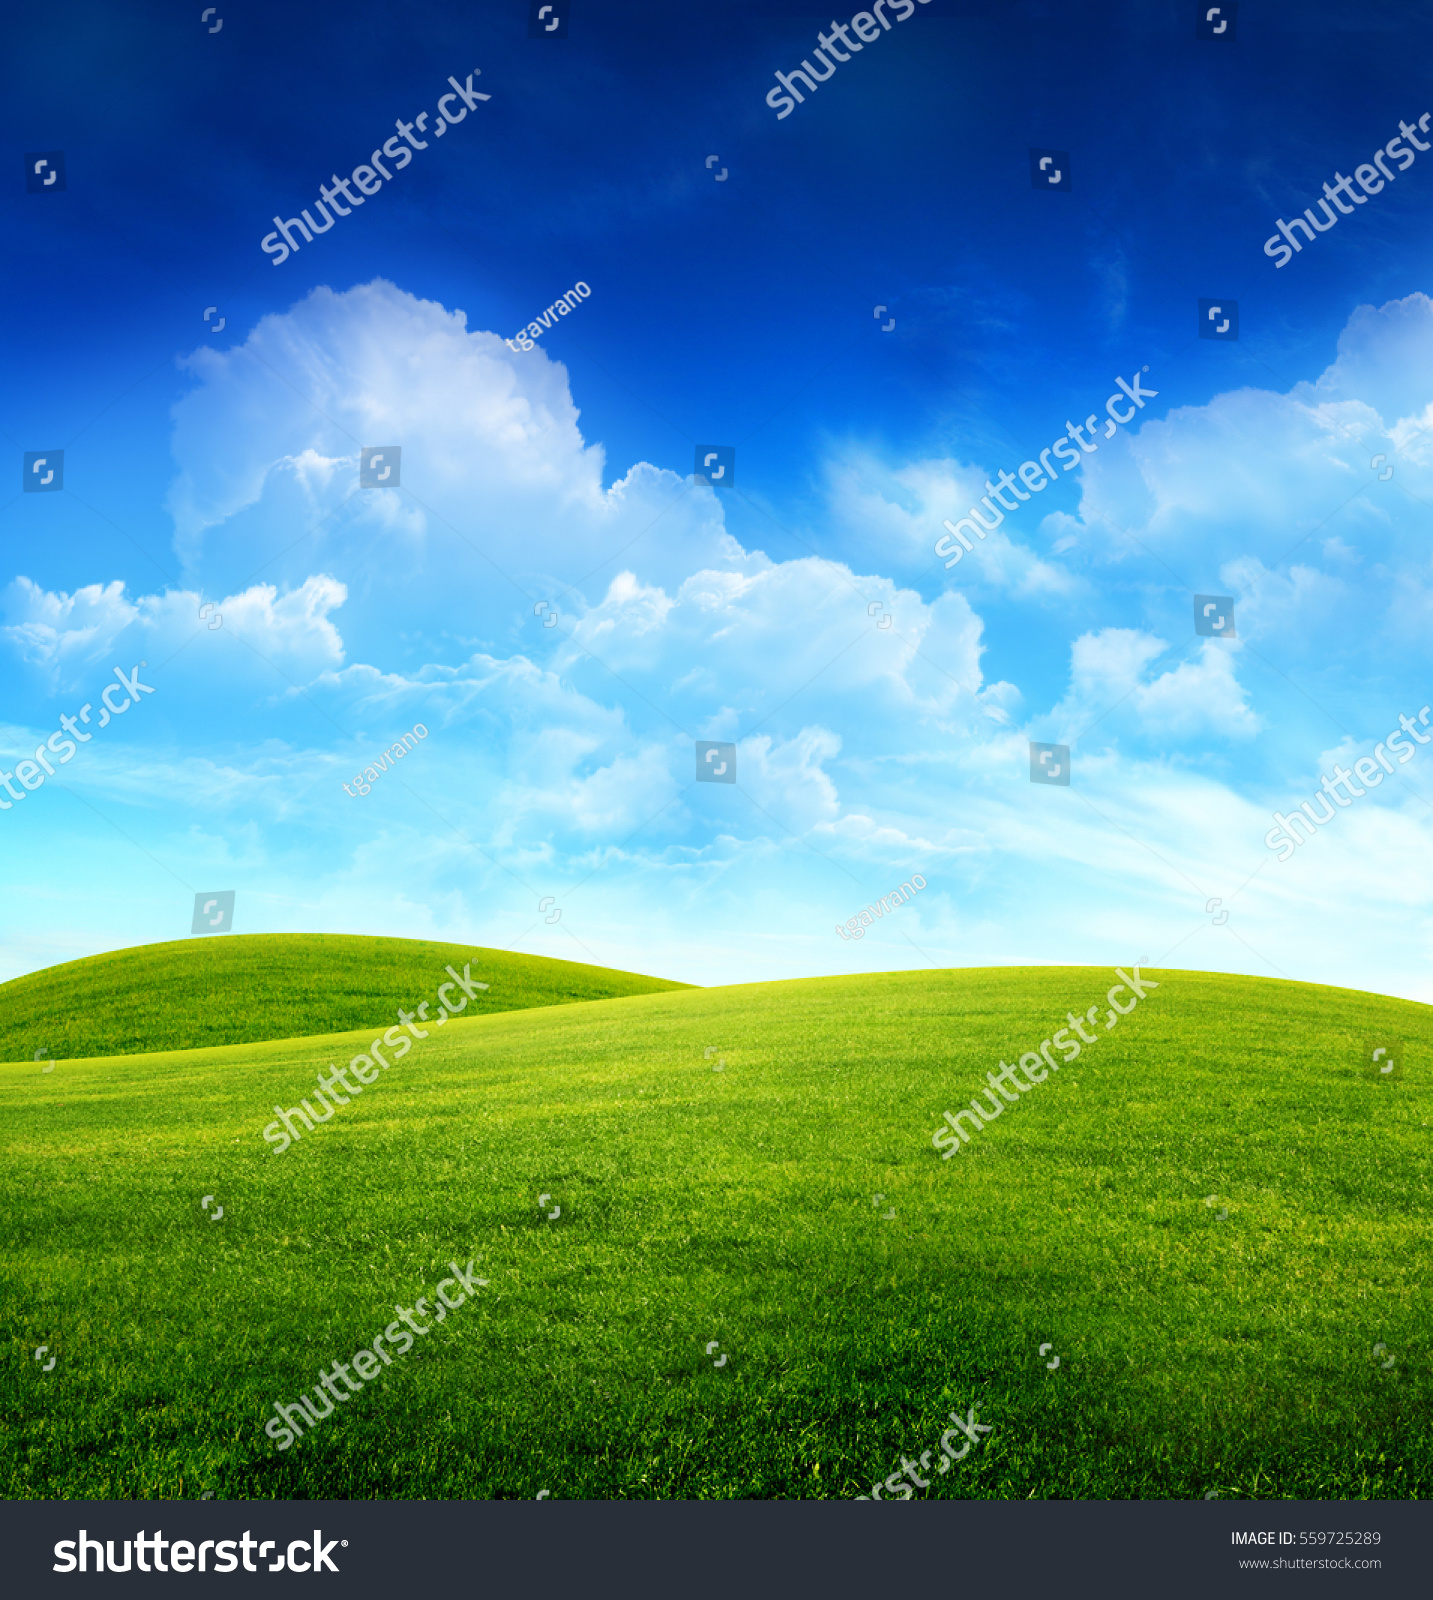 green grass field on small hills stock photo (edit now)- shutterstock